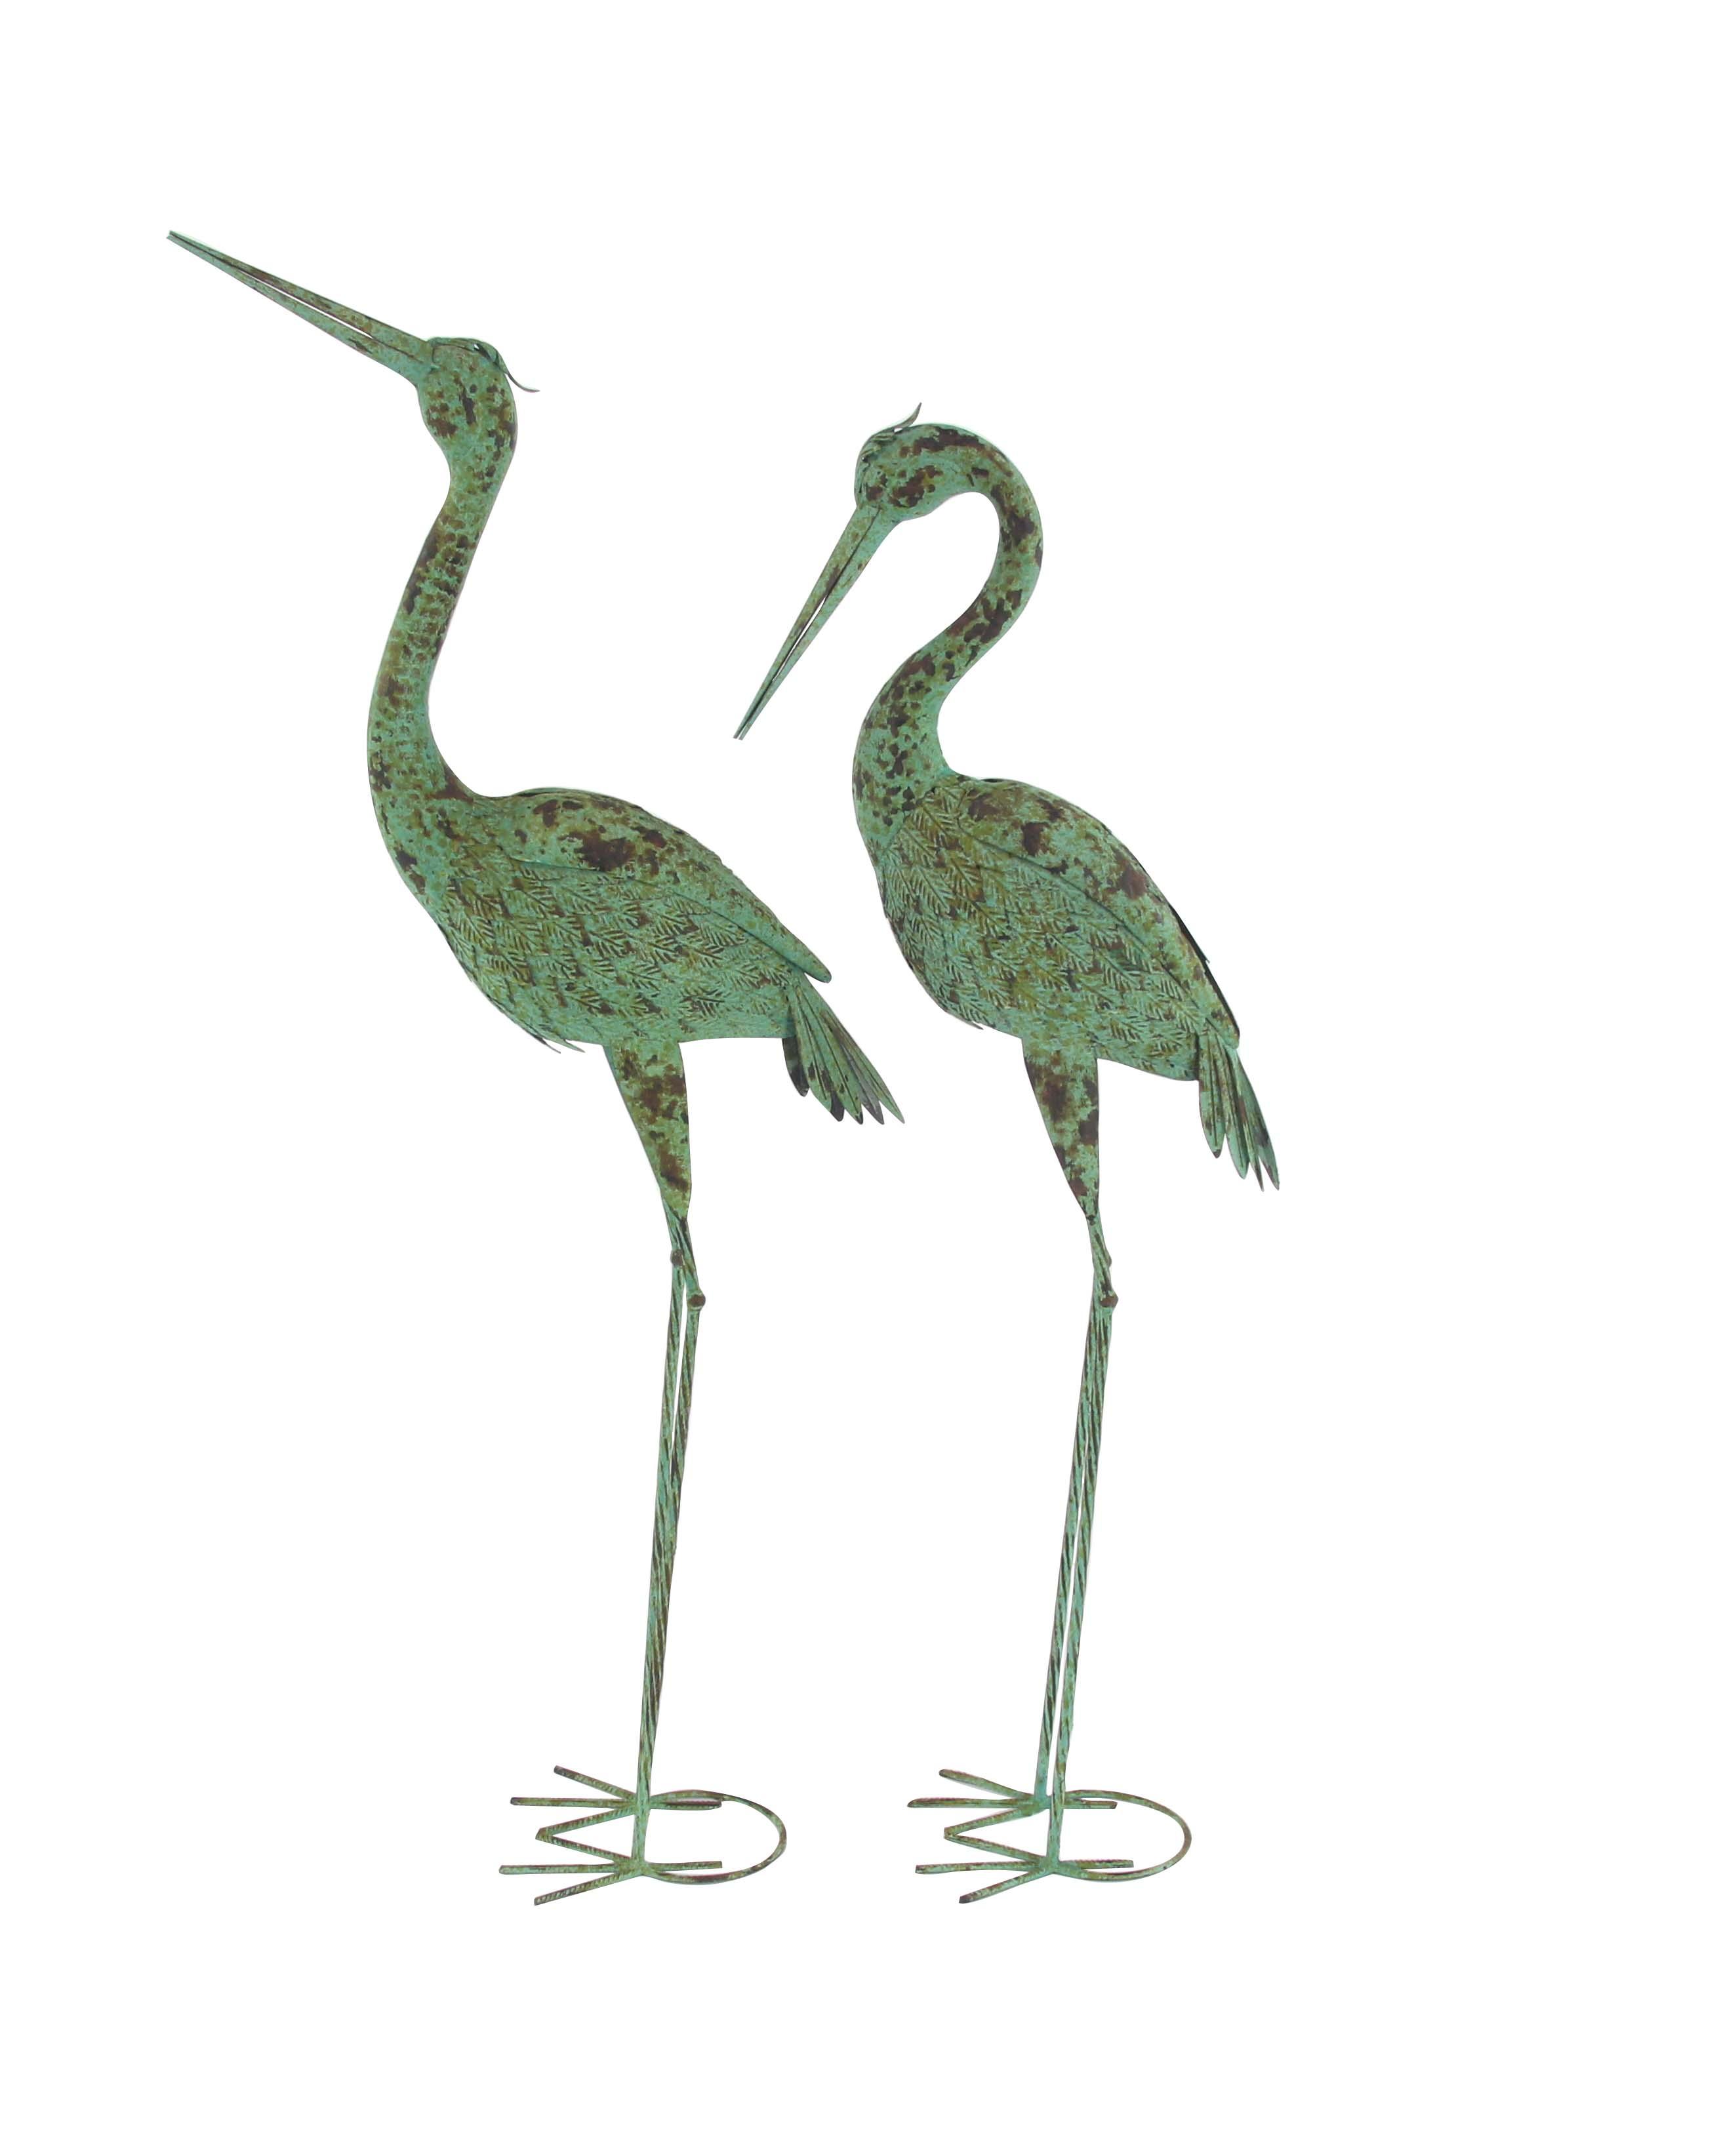 Decmode Pair of Rustic Iron Standing Garden Crane Sculptures, Green by DecMode